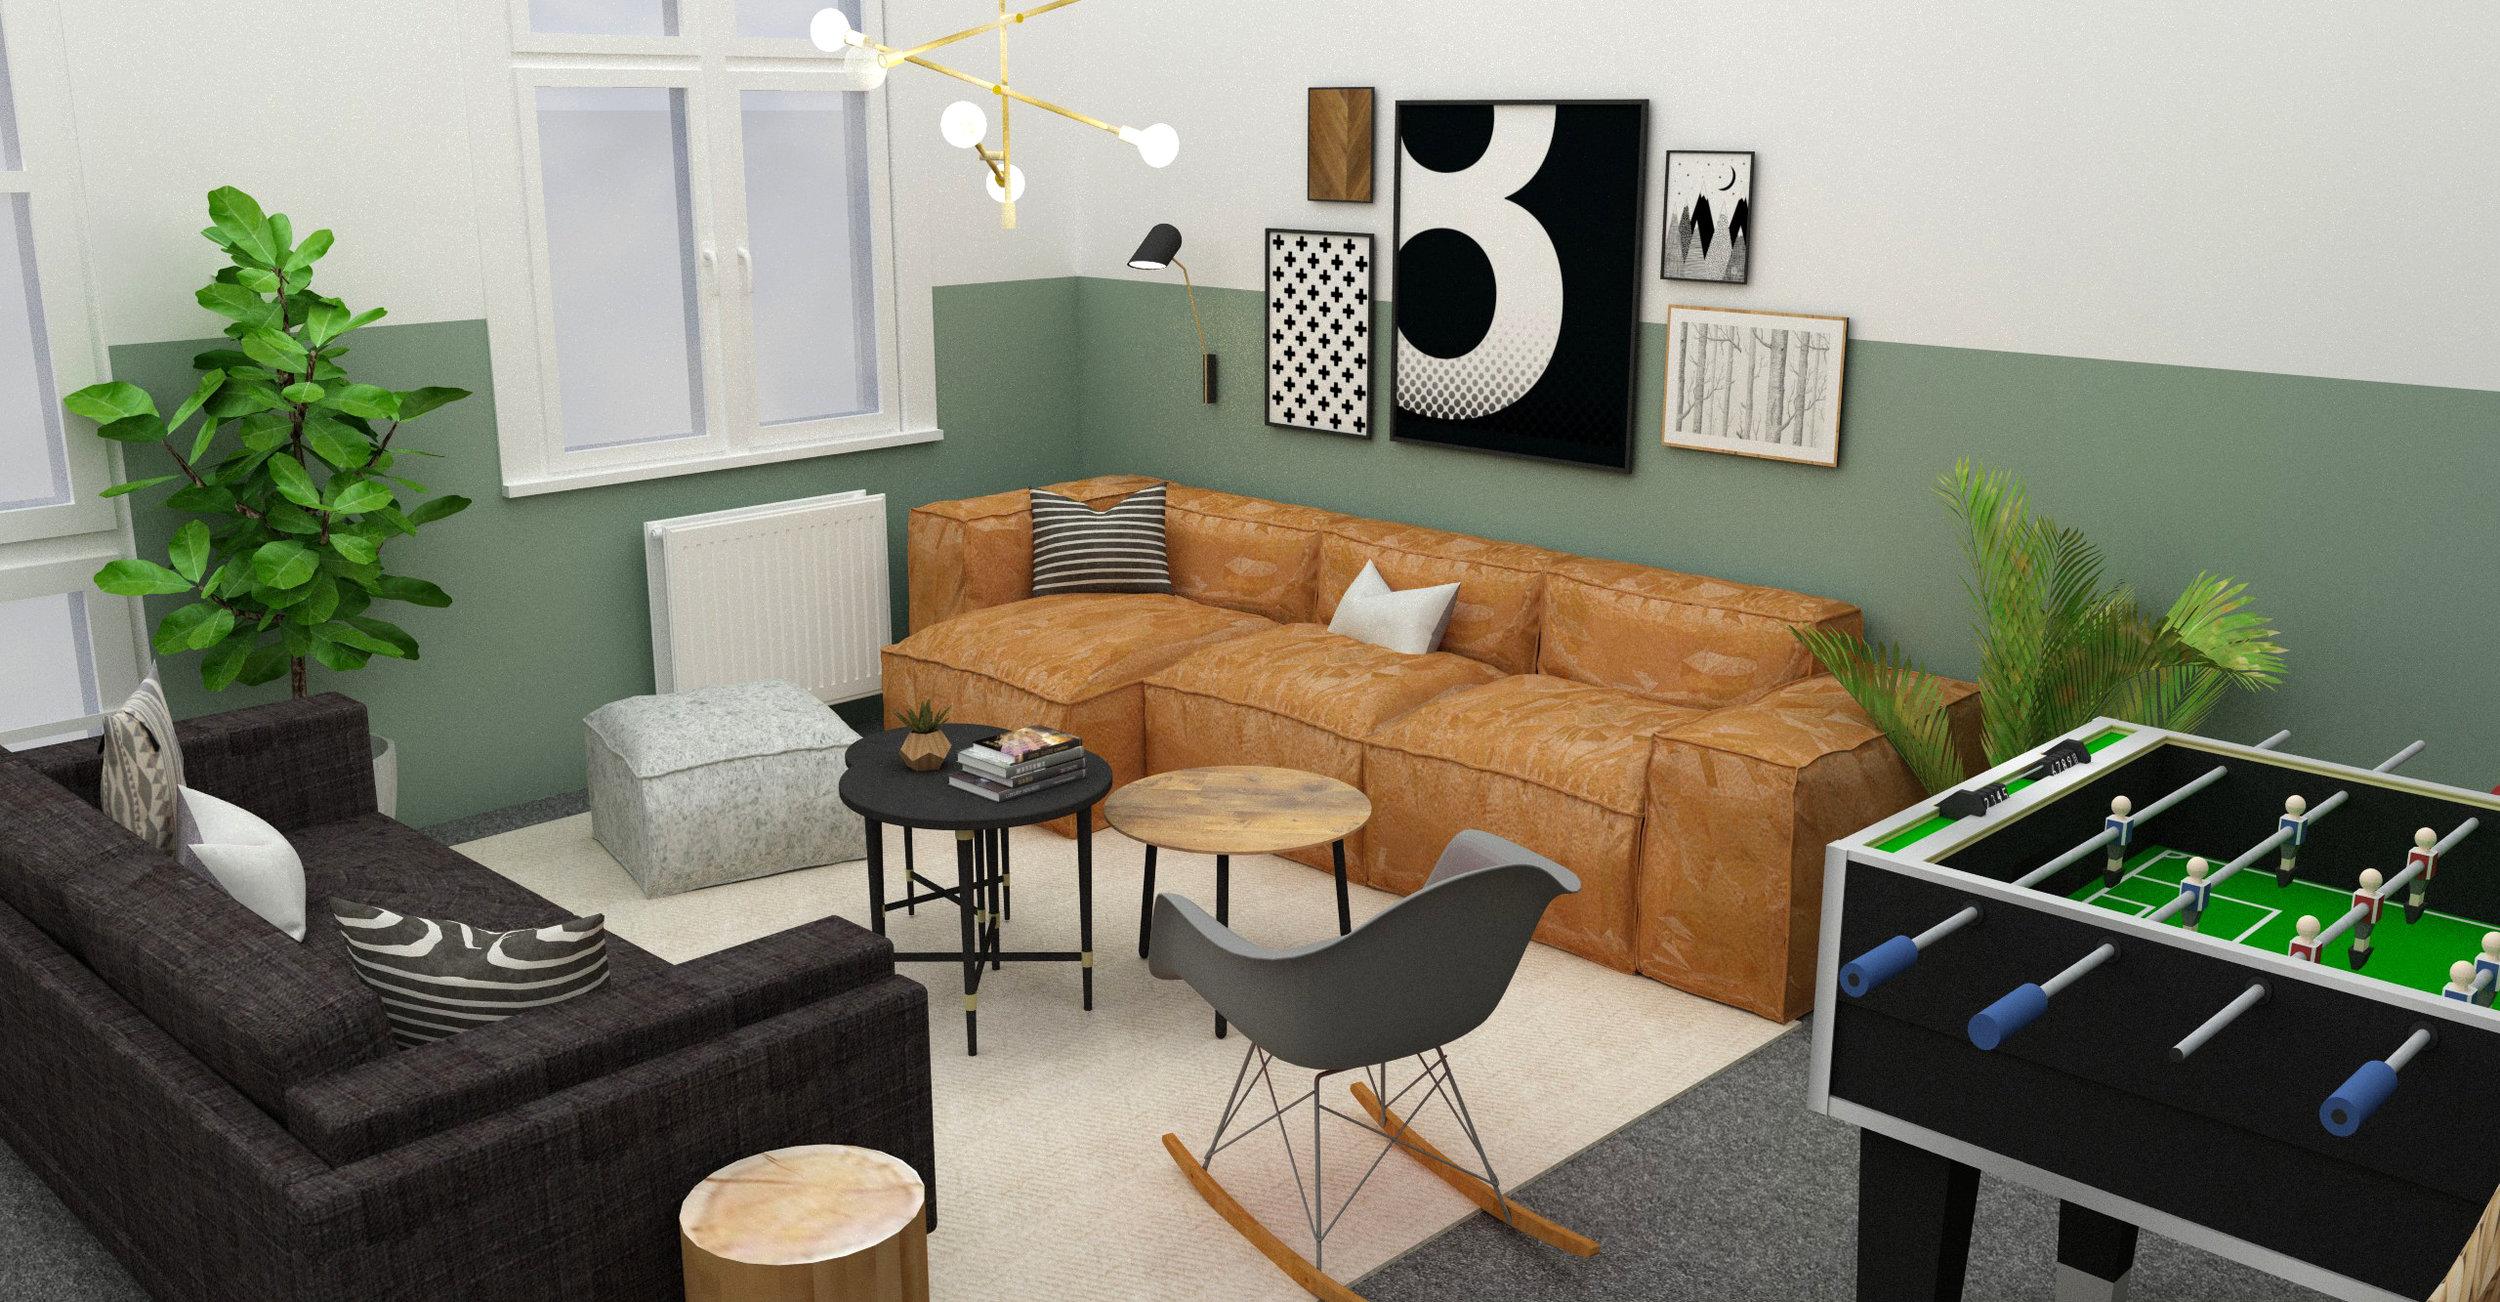 3D-floorplan+designed4 2016-11-26 13543500000.jpg